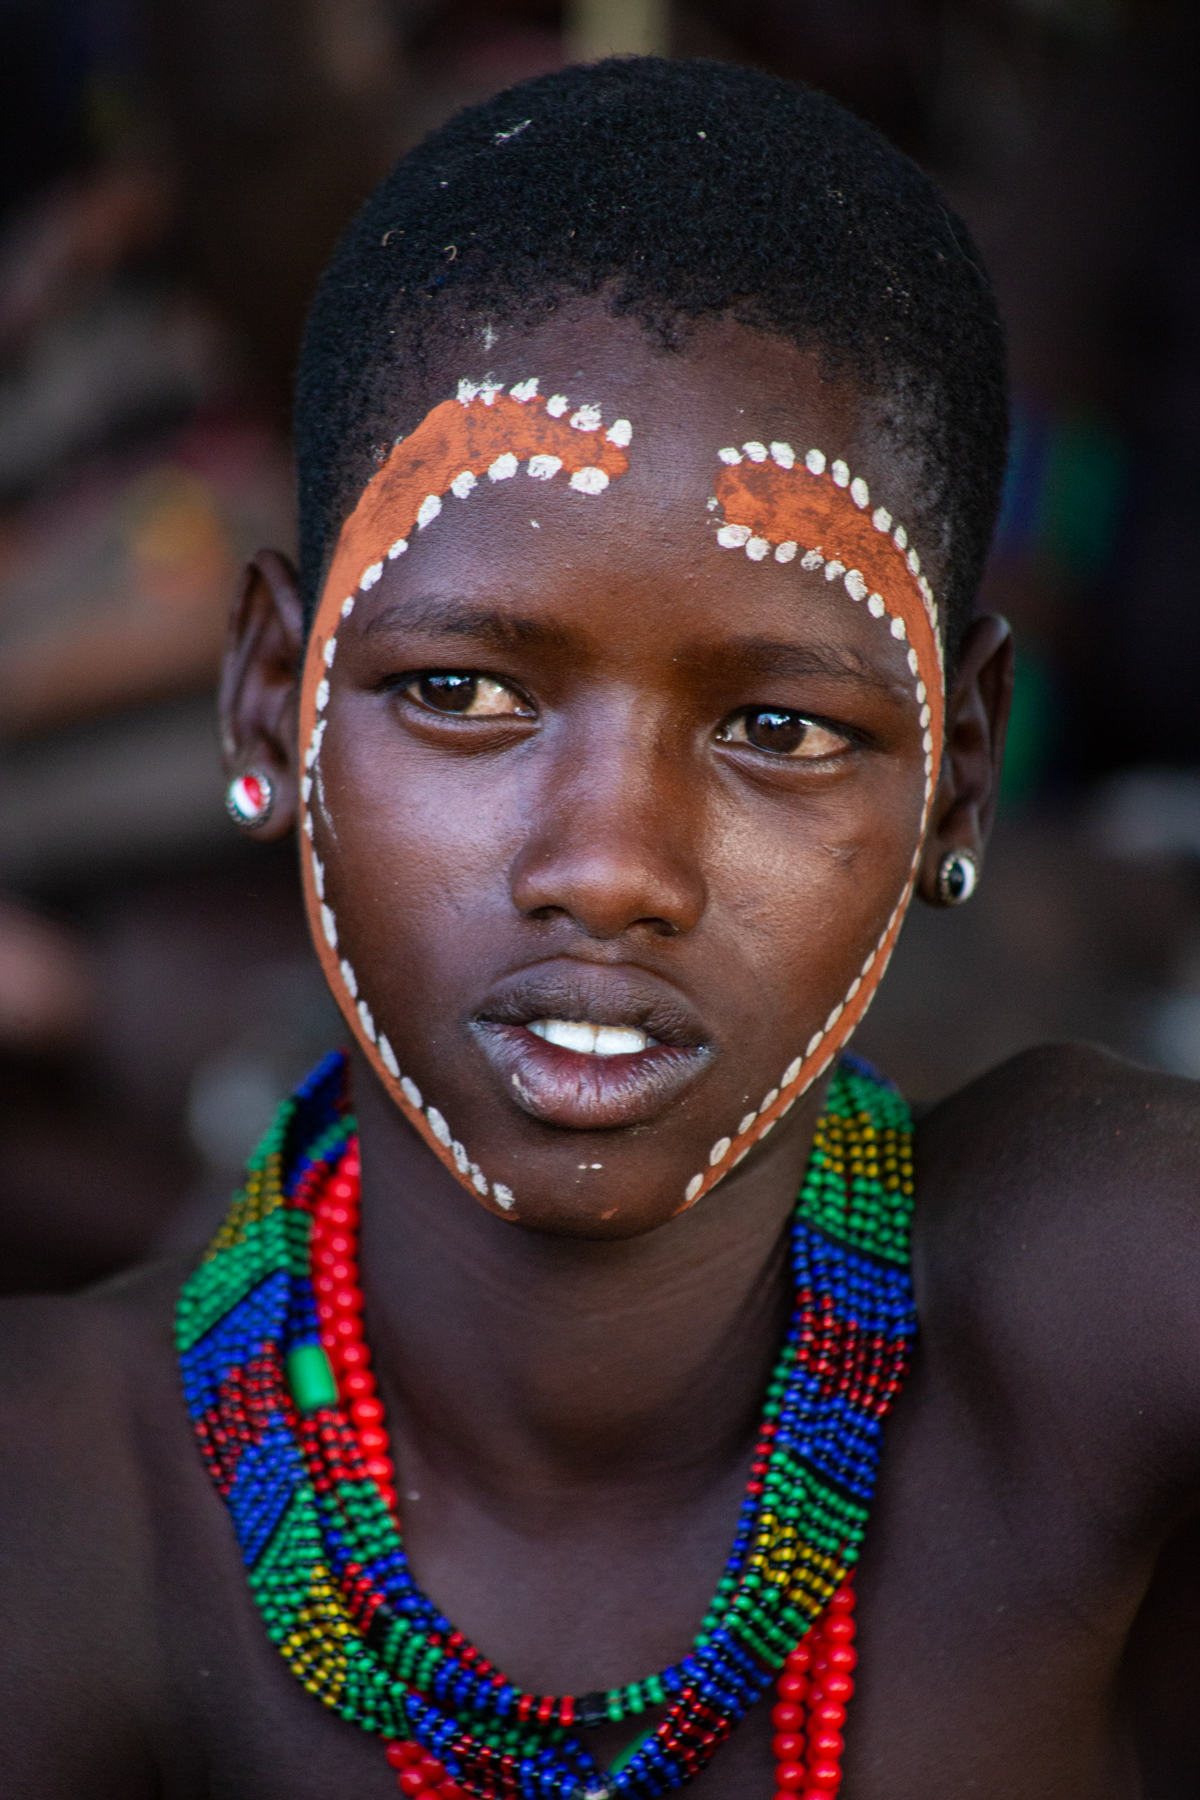 Attractive ethiopian men 3 Secrets